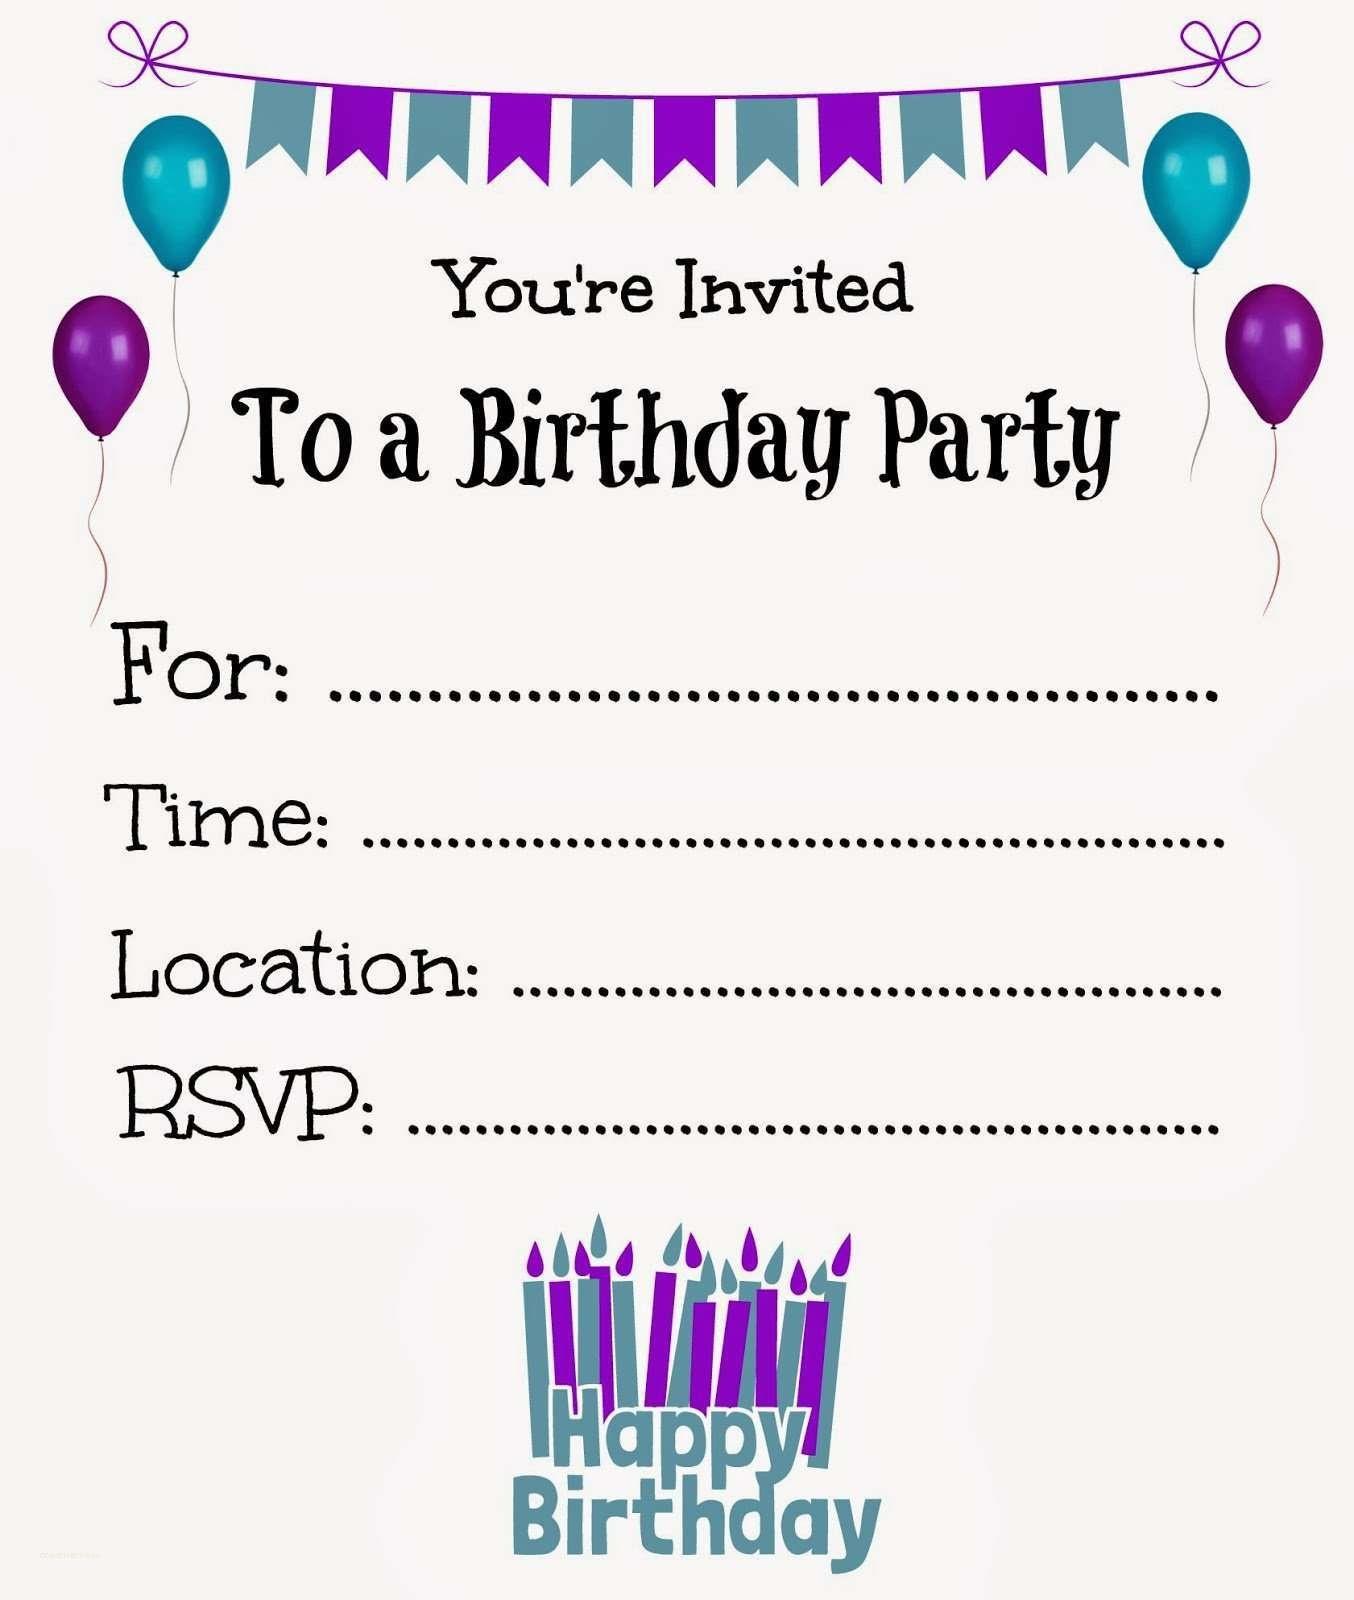 Online Birthday Invite Templates - Tutlin.psstech.co - Invitations Templates Online Free Printable